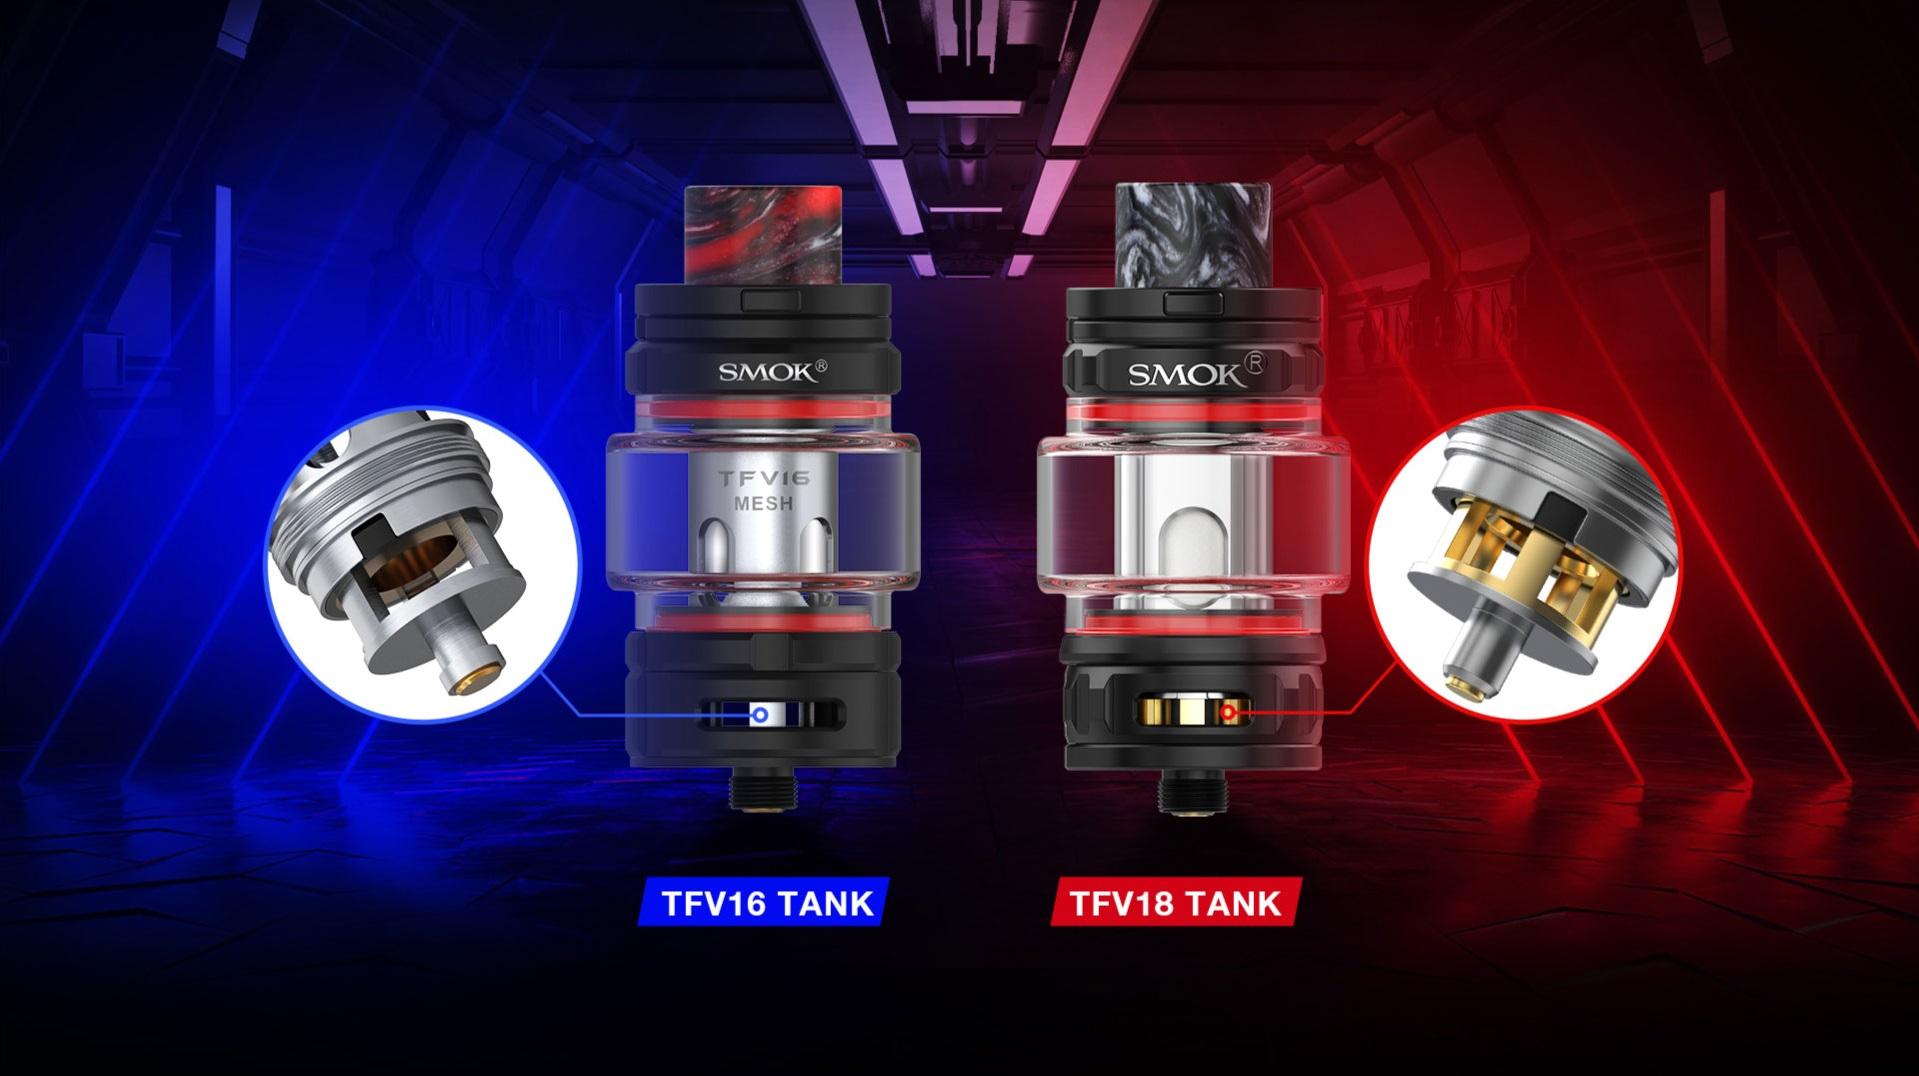 tfv18 tank 7 5ml by smoktech 2 - TFV18 Beast Tank 7.5ml